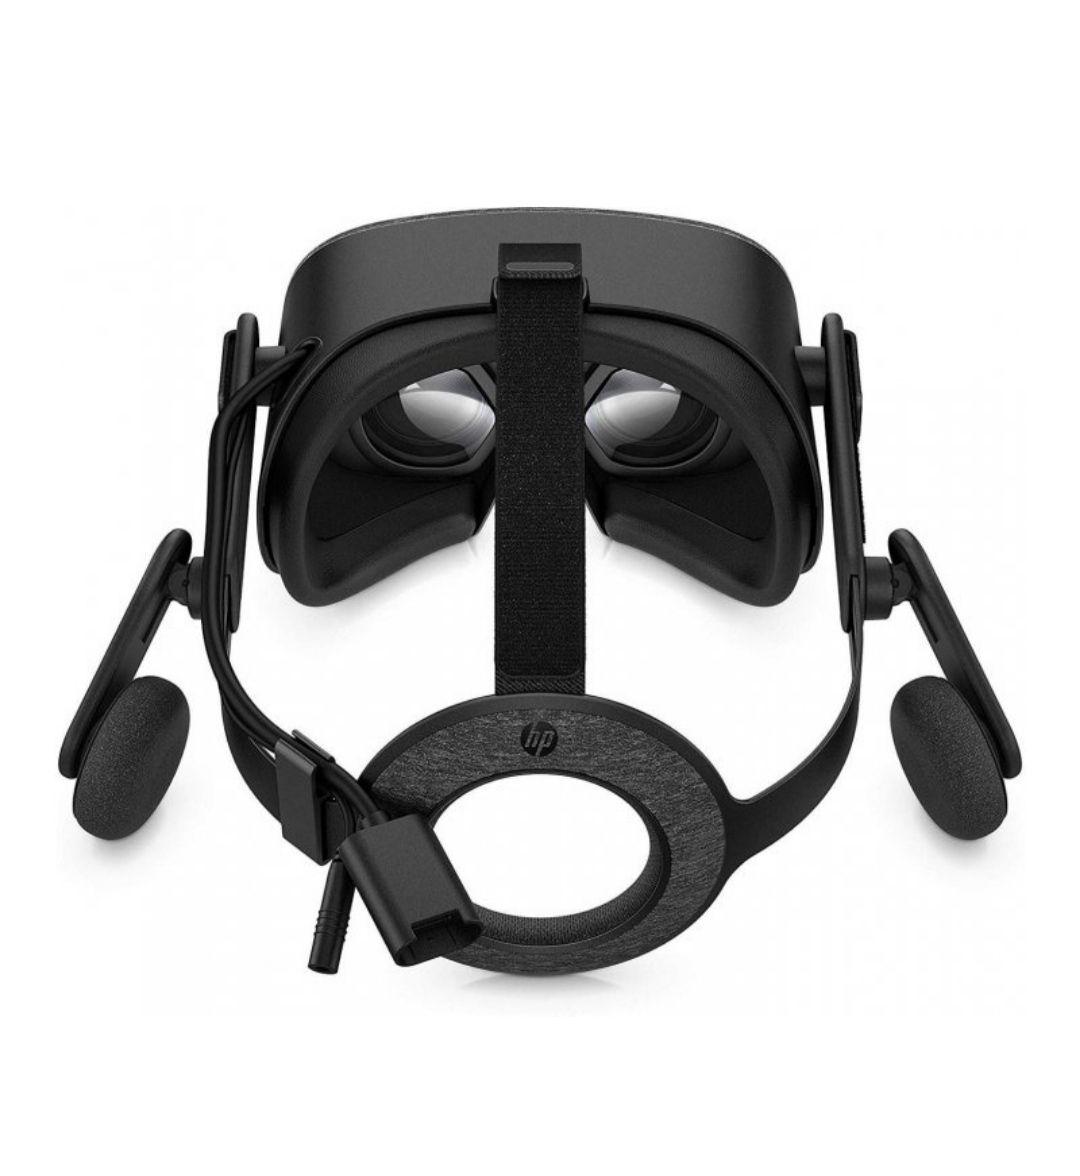 Gogle HP Reverb VR Dostępne 30 sztuk!